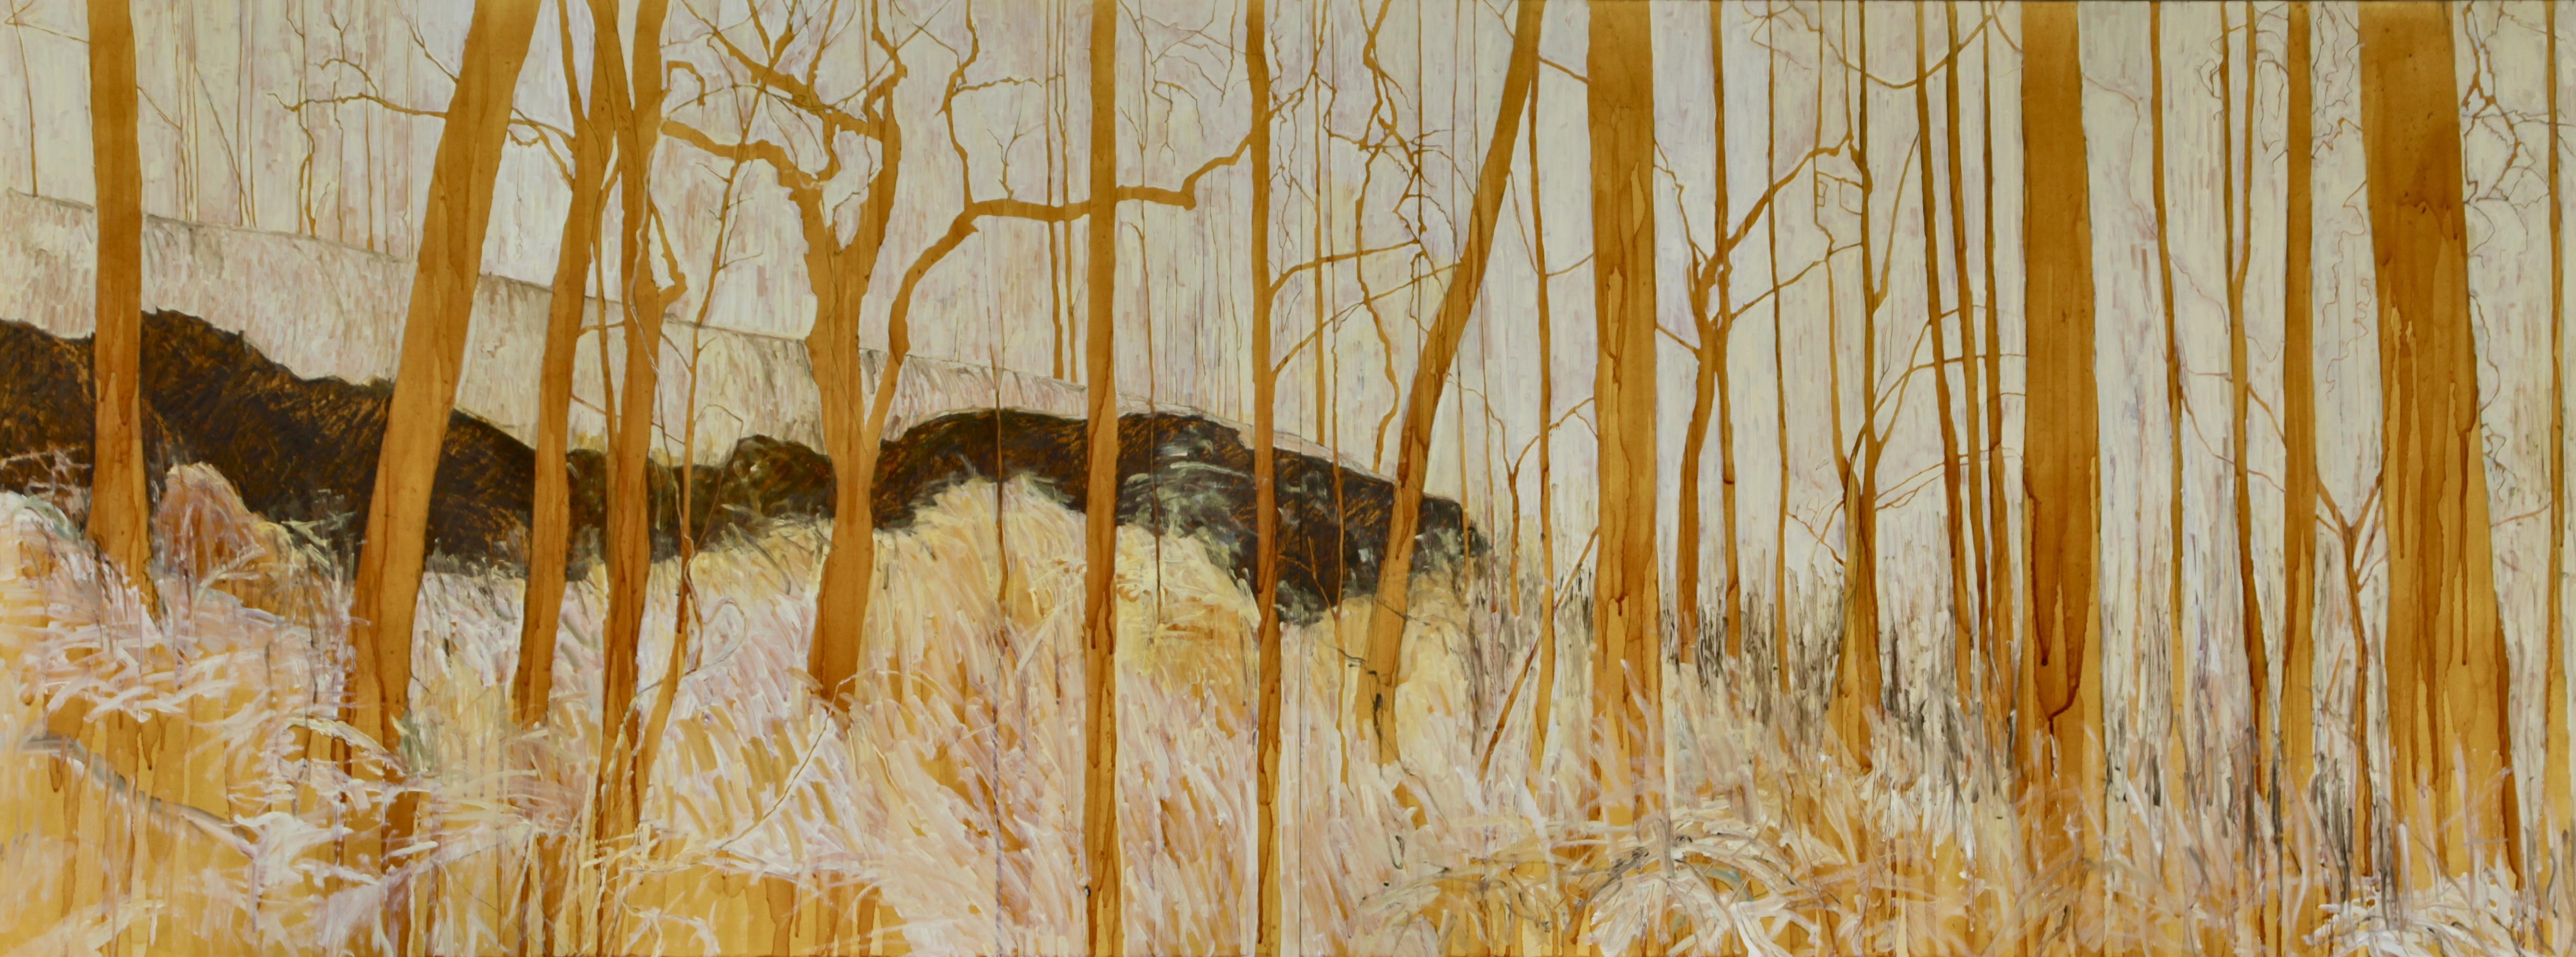 Watagan ethereality, 90 x 240 cm